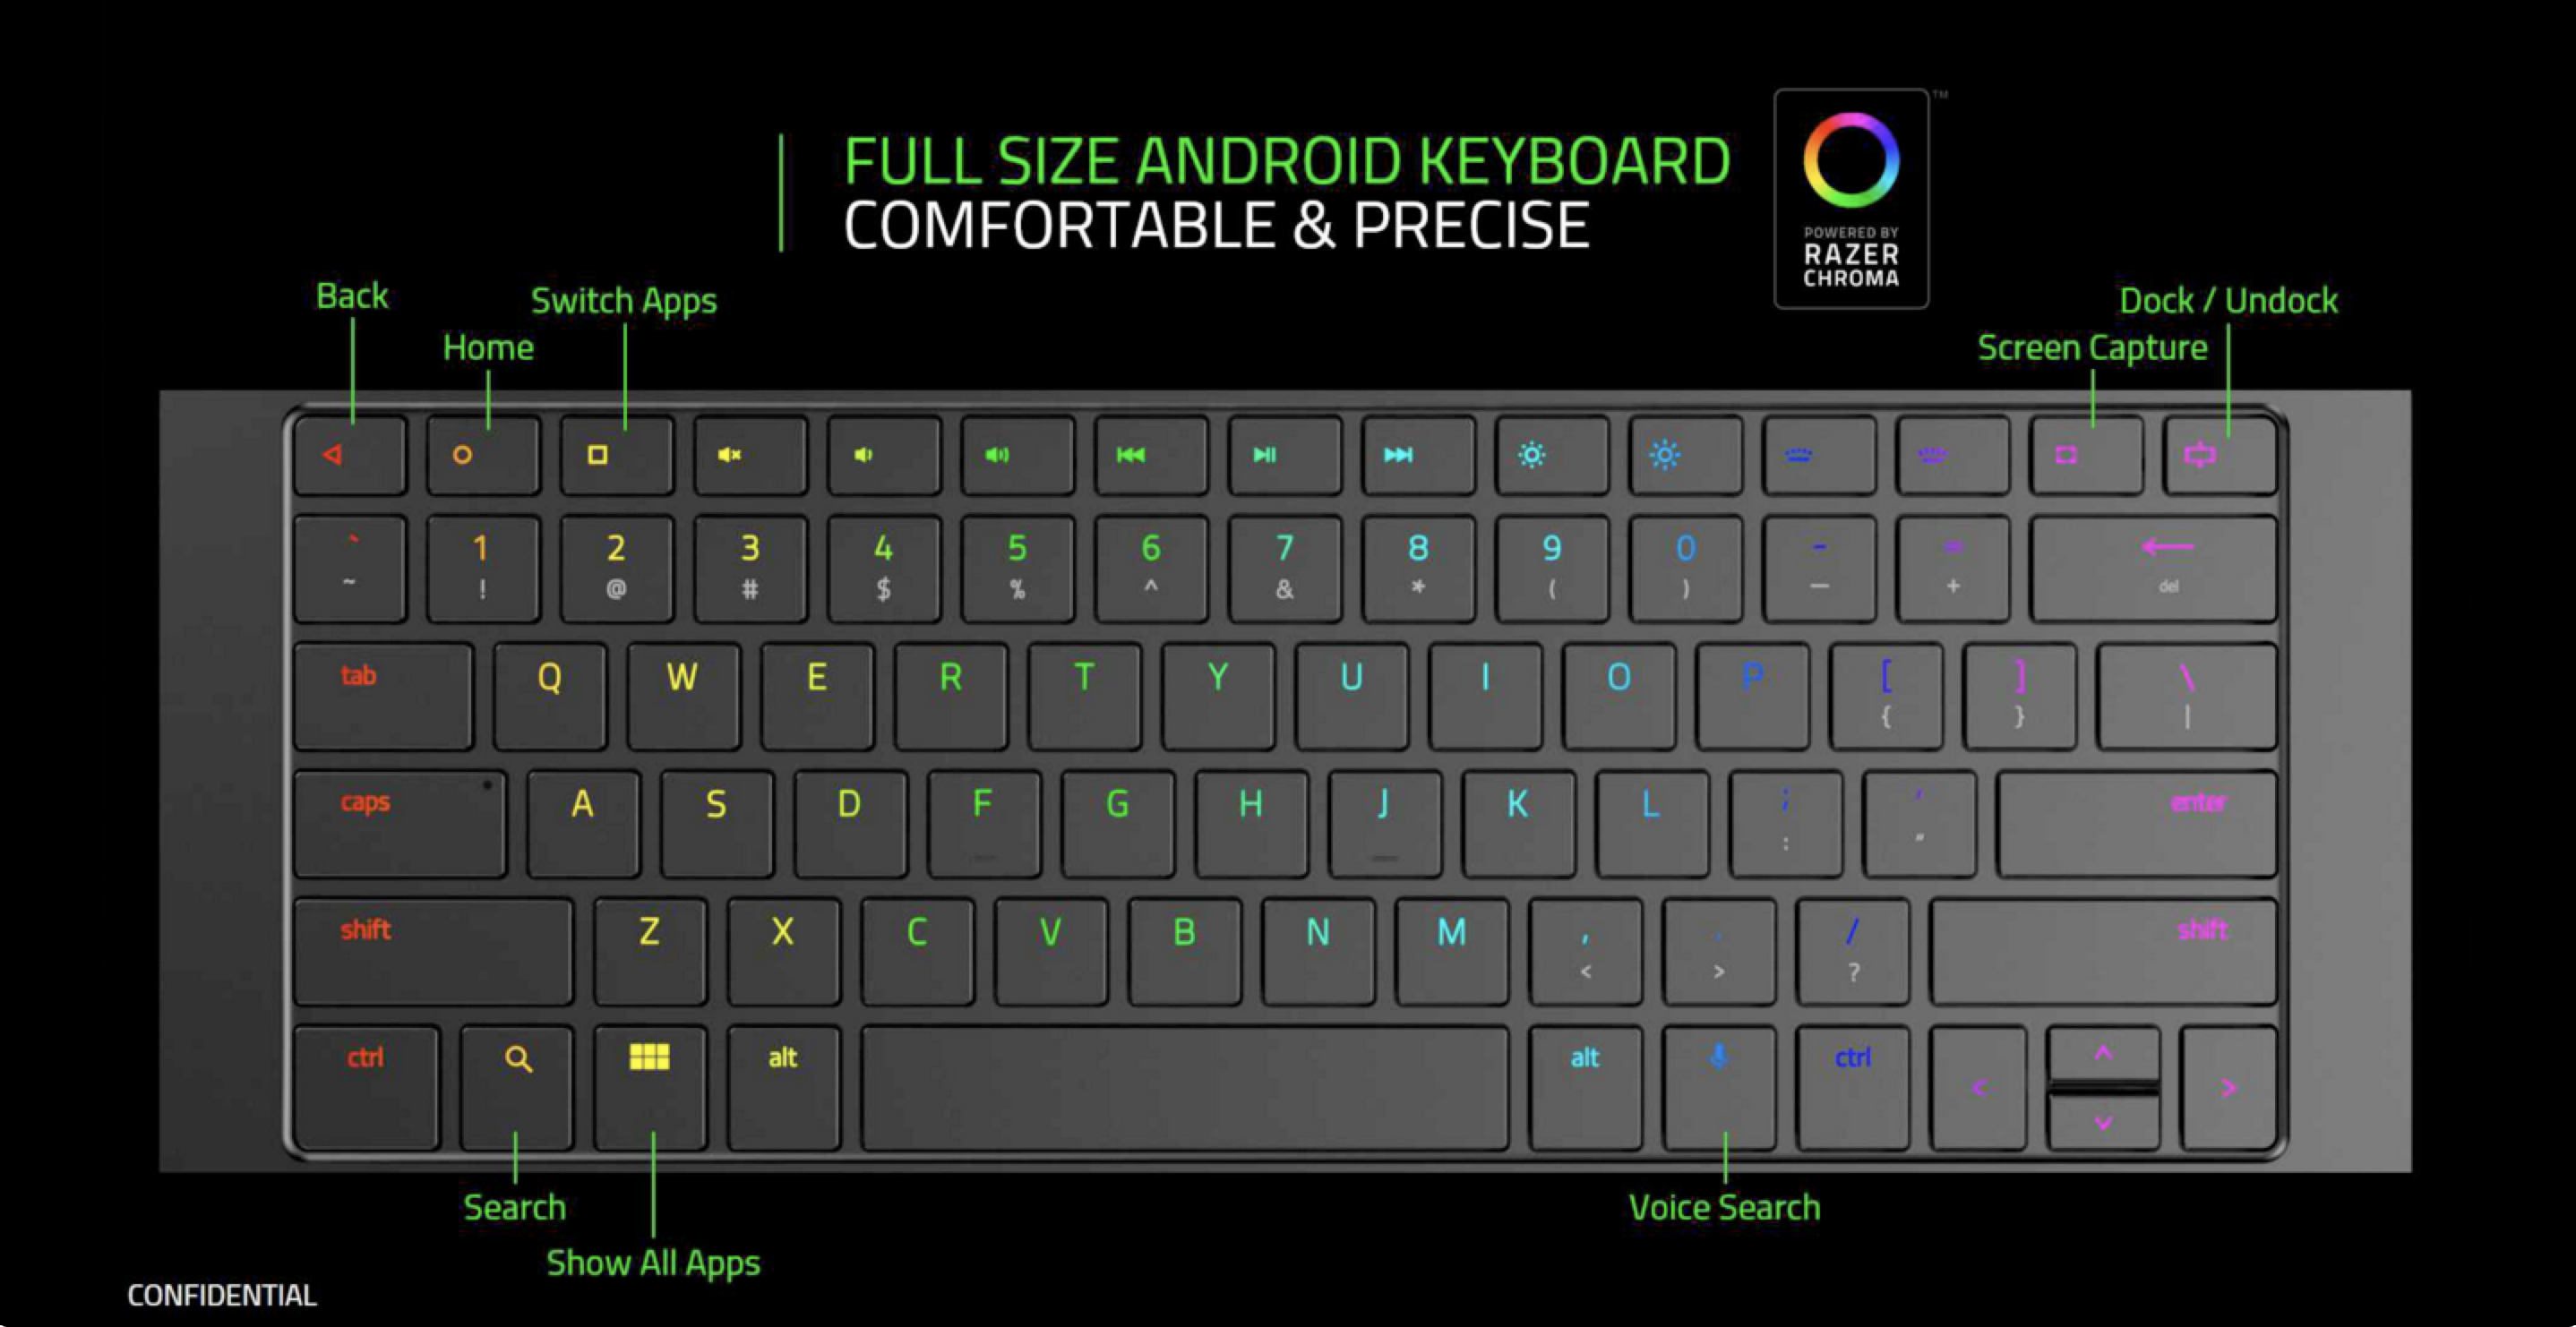 turn on laptop via keyboard